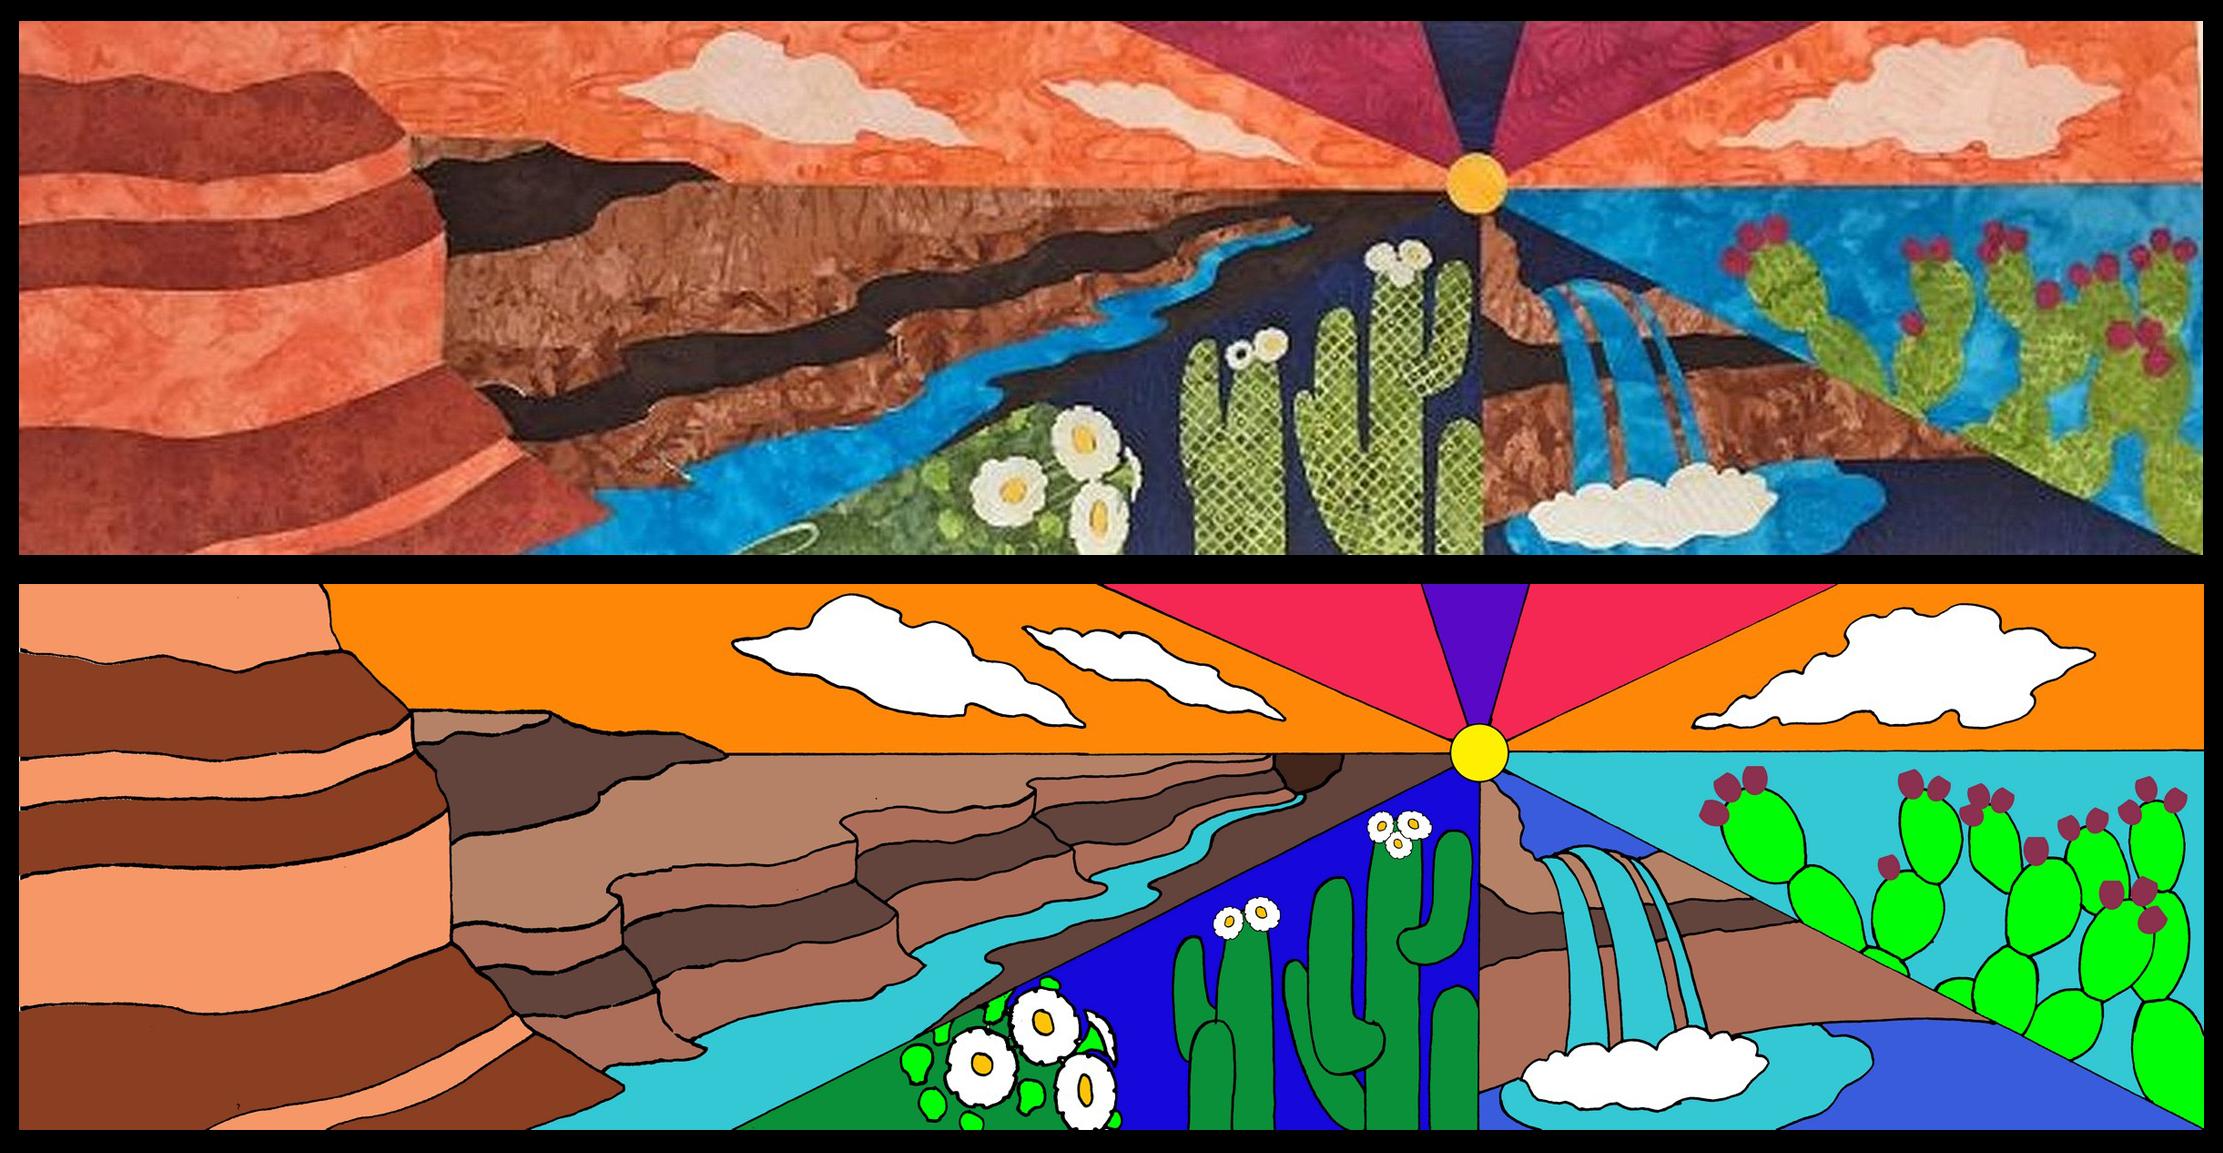 Desert Oasis quilt block design